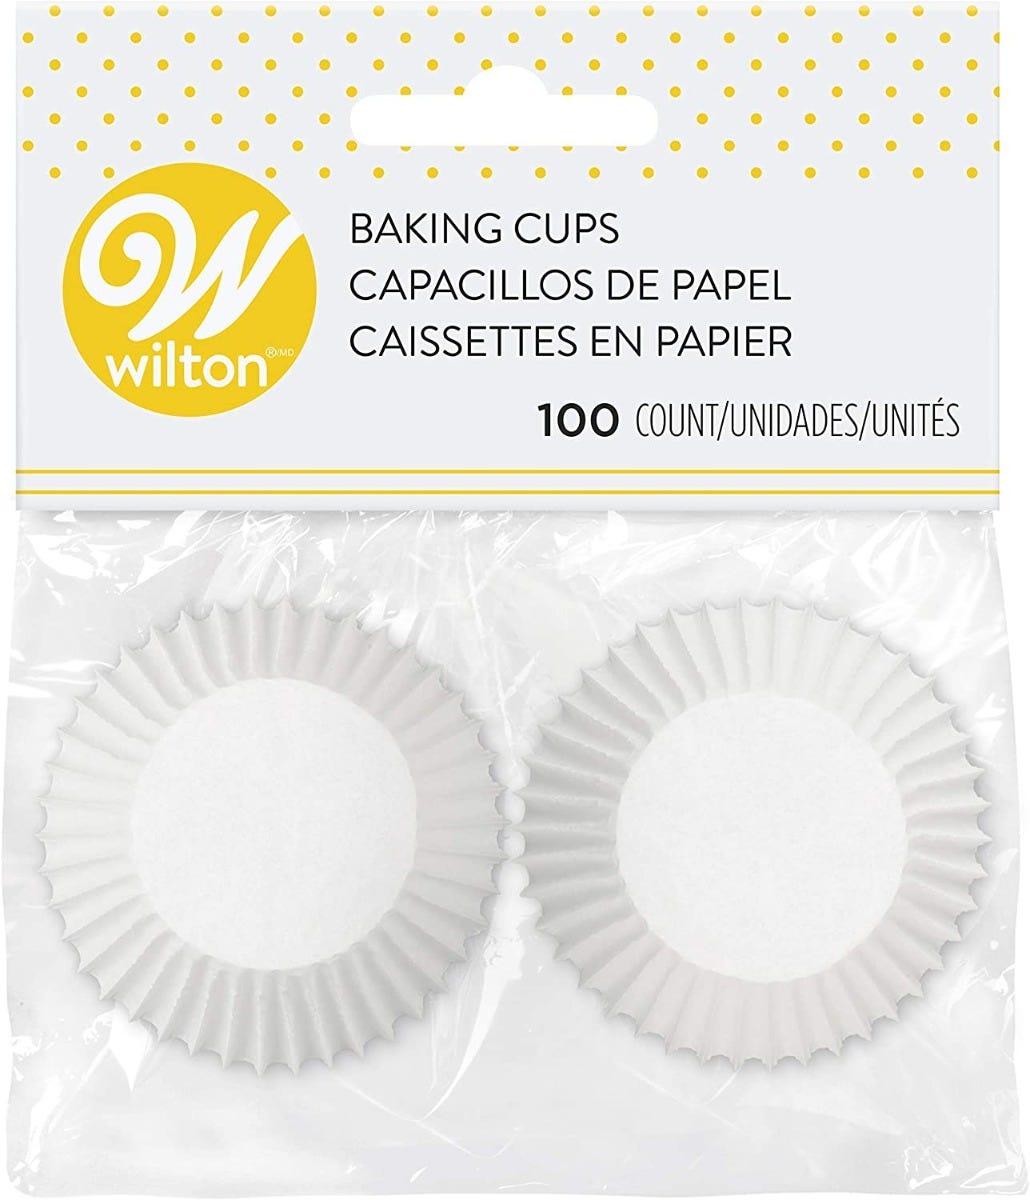 Capacillos para muffin Wilton®, 100 pzas